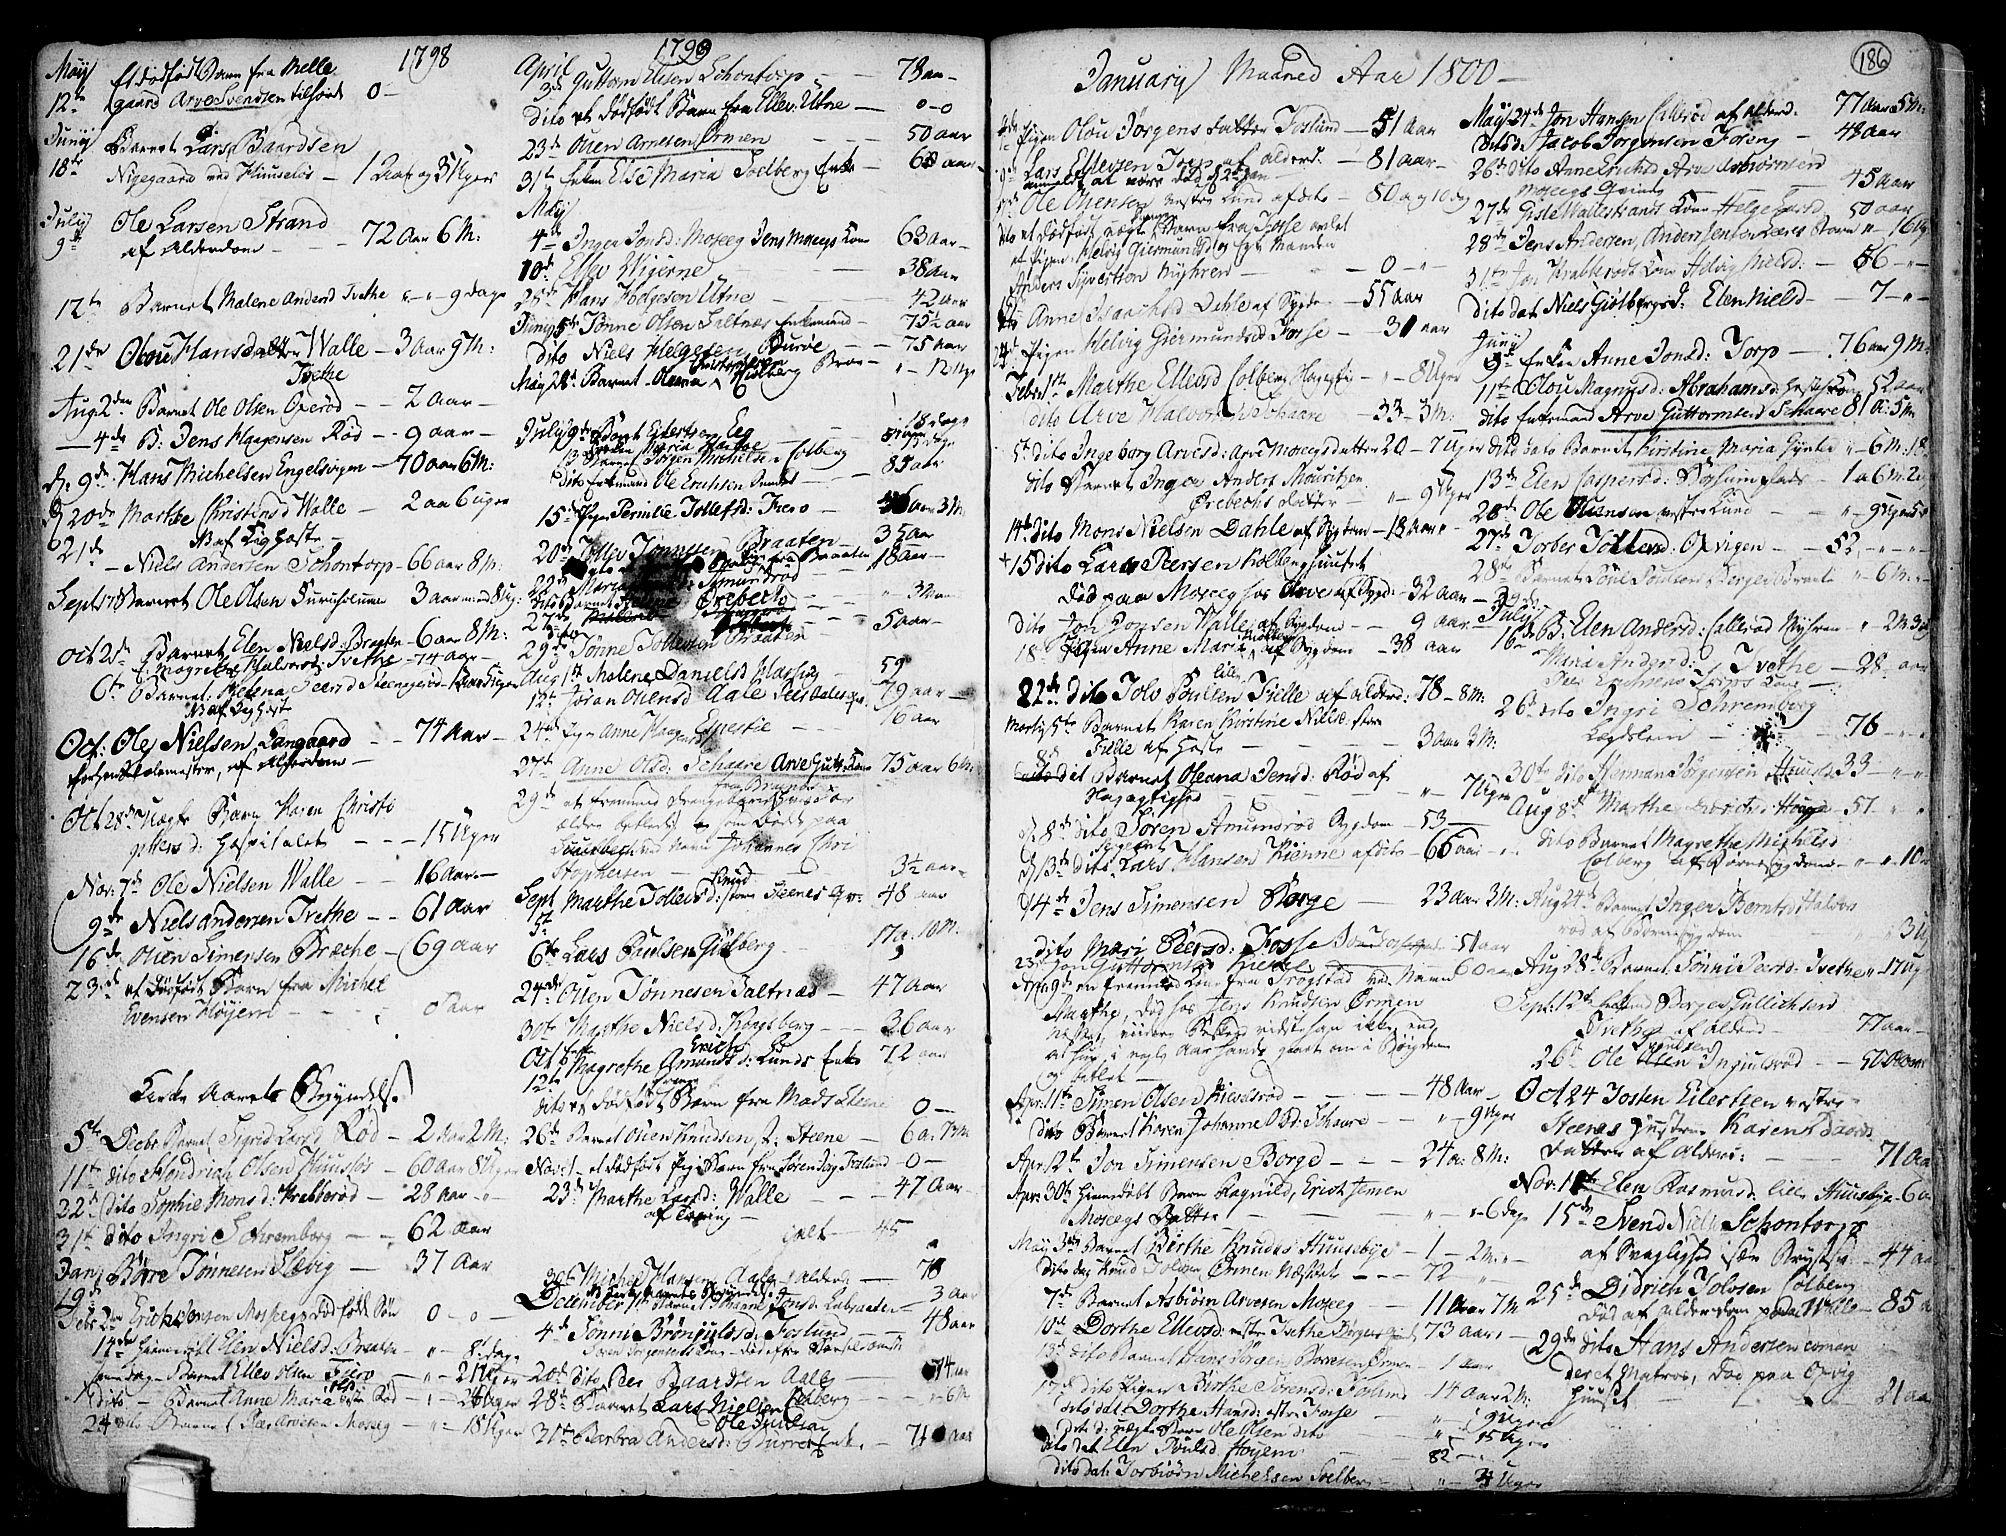 SAO, Onsøy prestekontor Kirkebøker, F/Fa/L0001: Ministerialbok nr. I 1, 1733-1814, s. 186